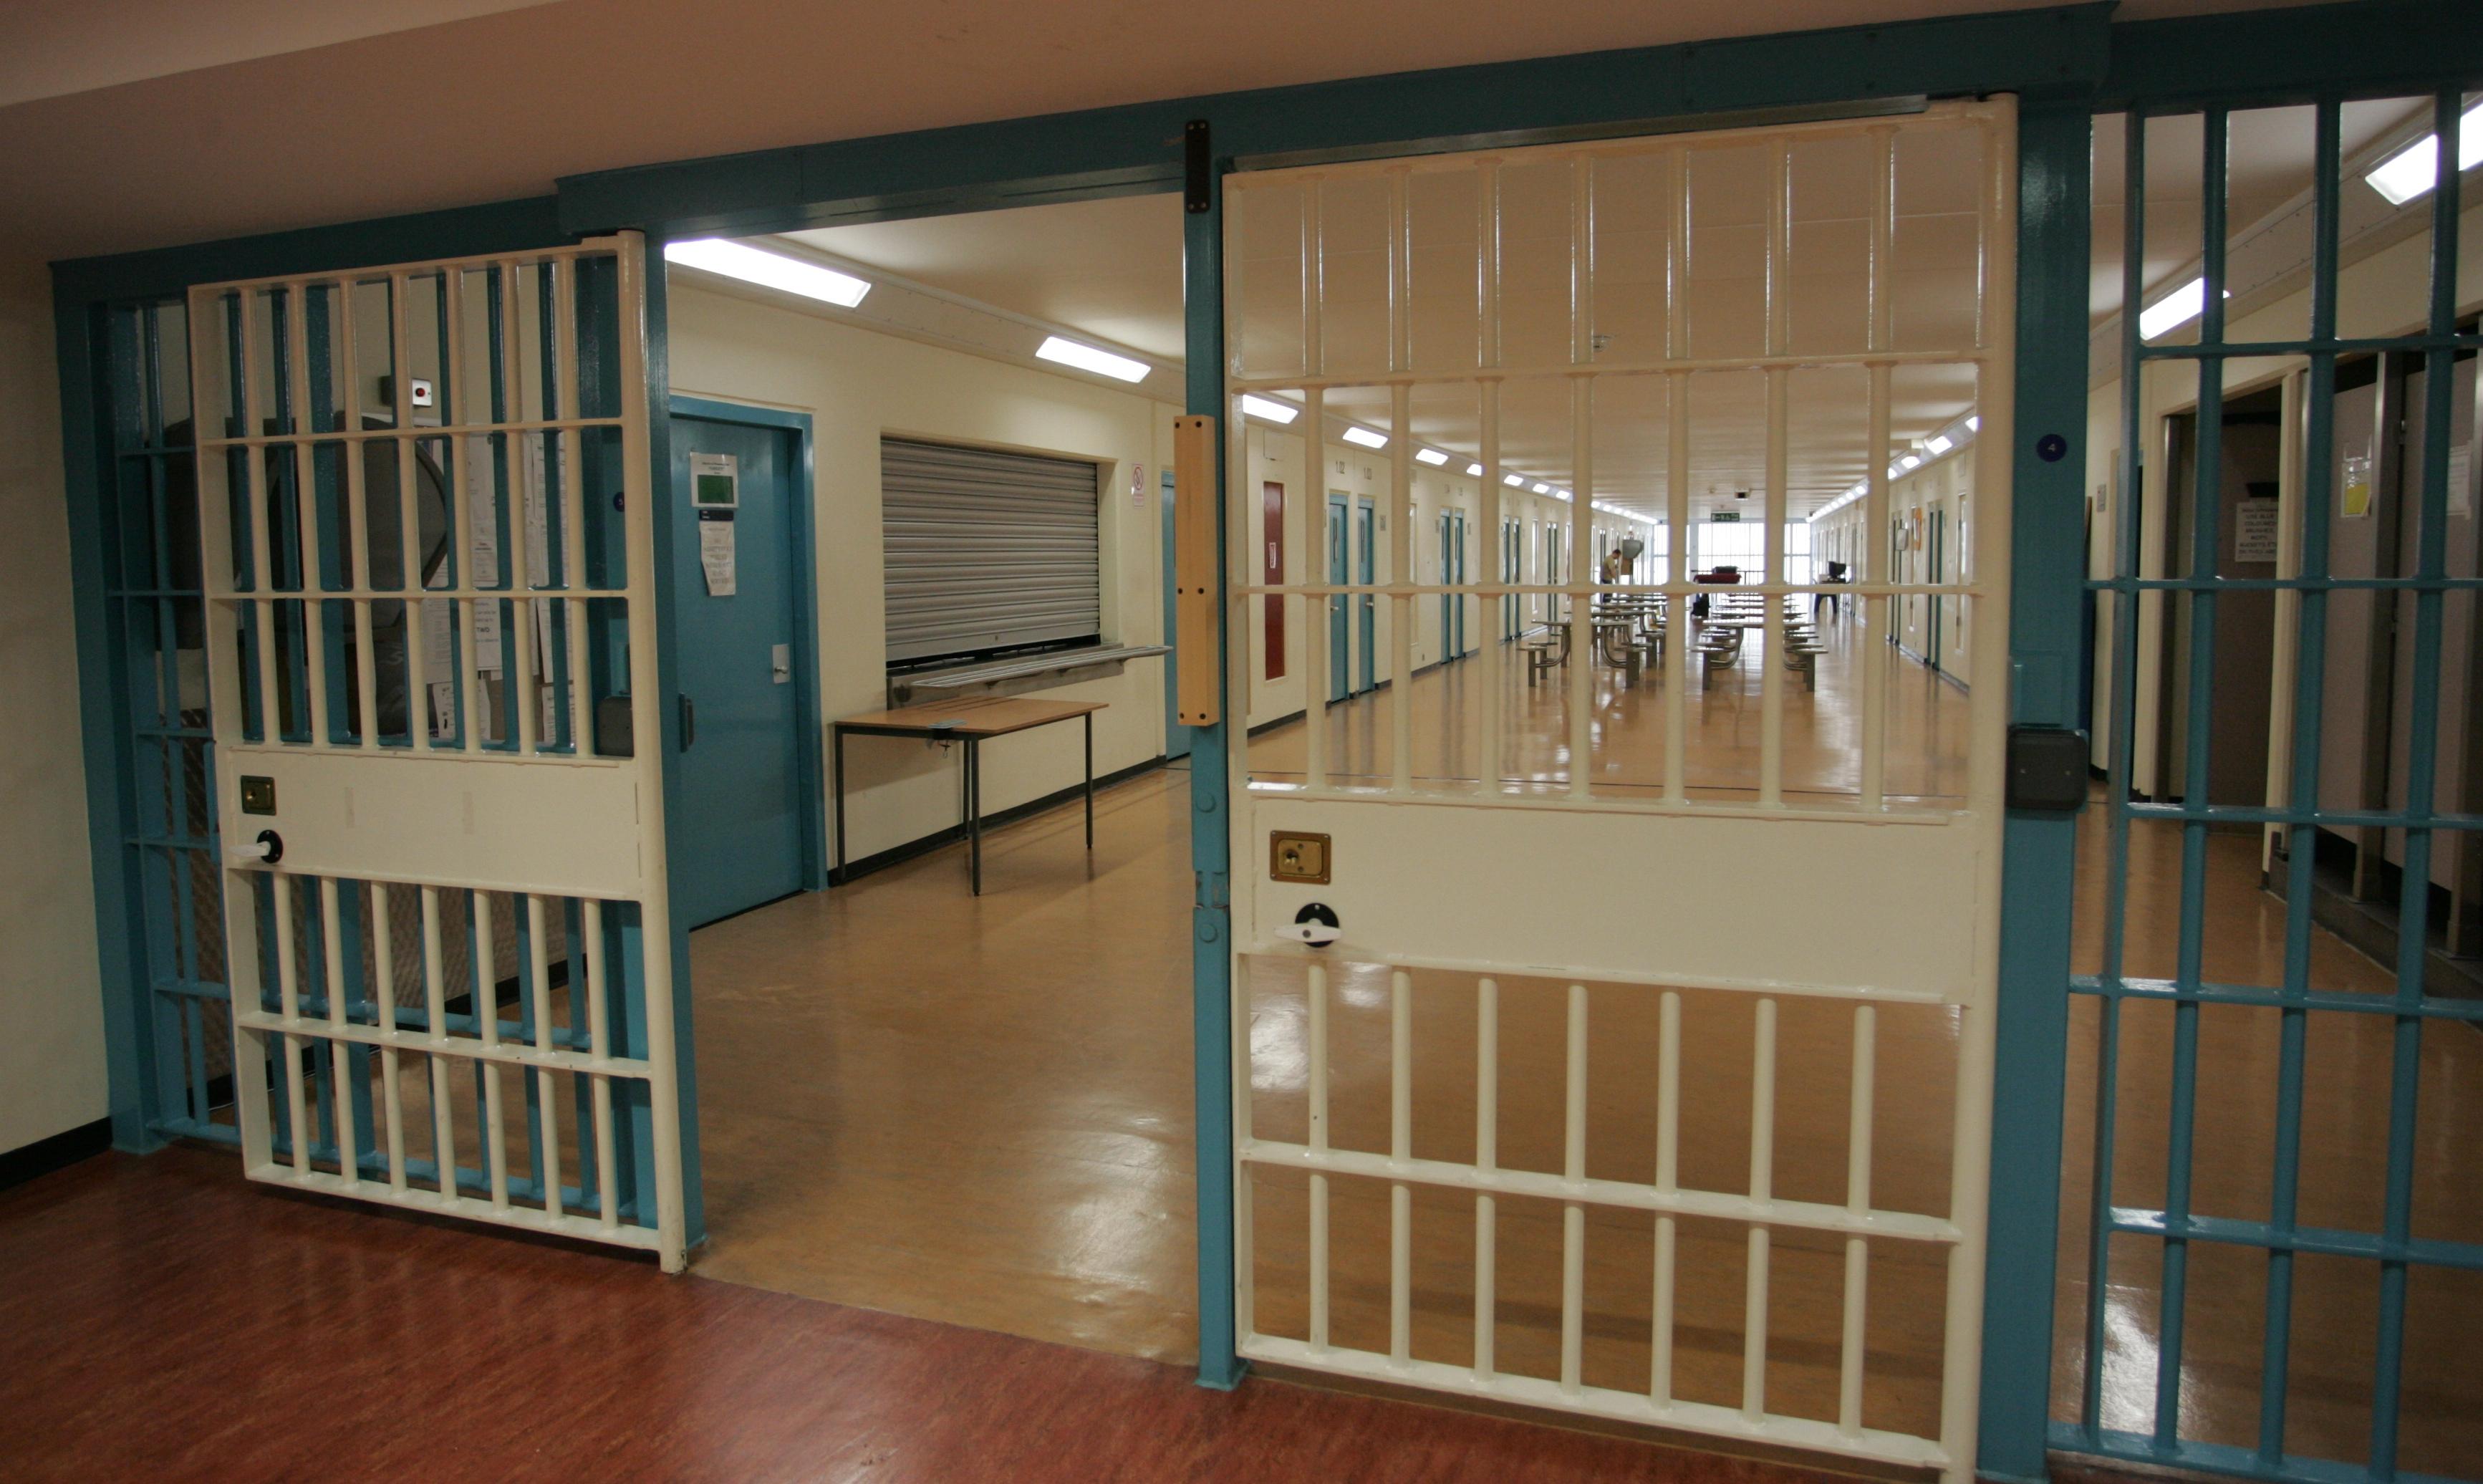 pincess-ann-prison-visit-15.jpg